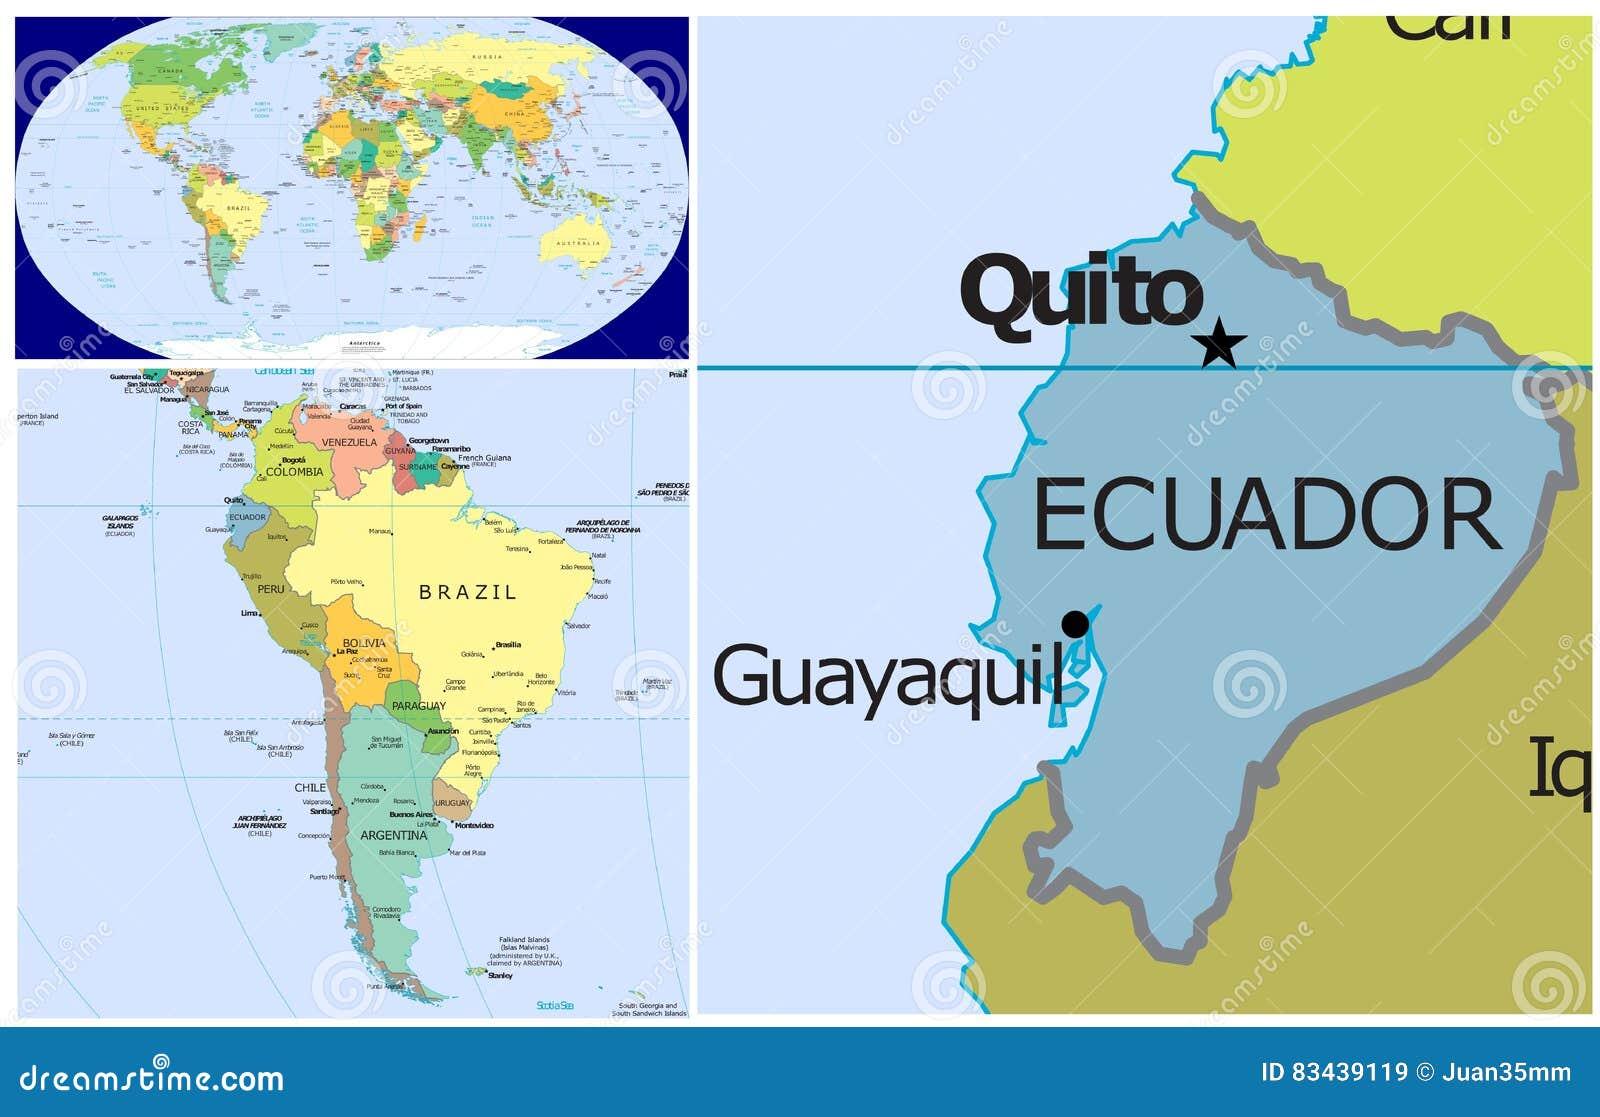 Where Is Ecuador Located On The World Map.Ecuador World Stock Illustration Illustration Of Arctic 83439119